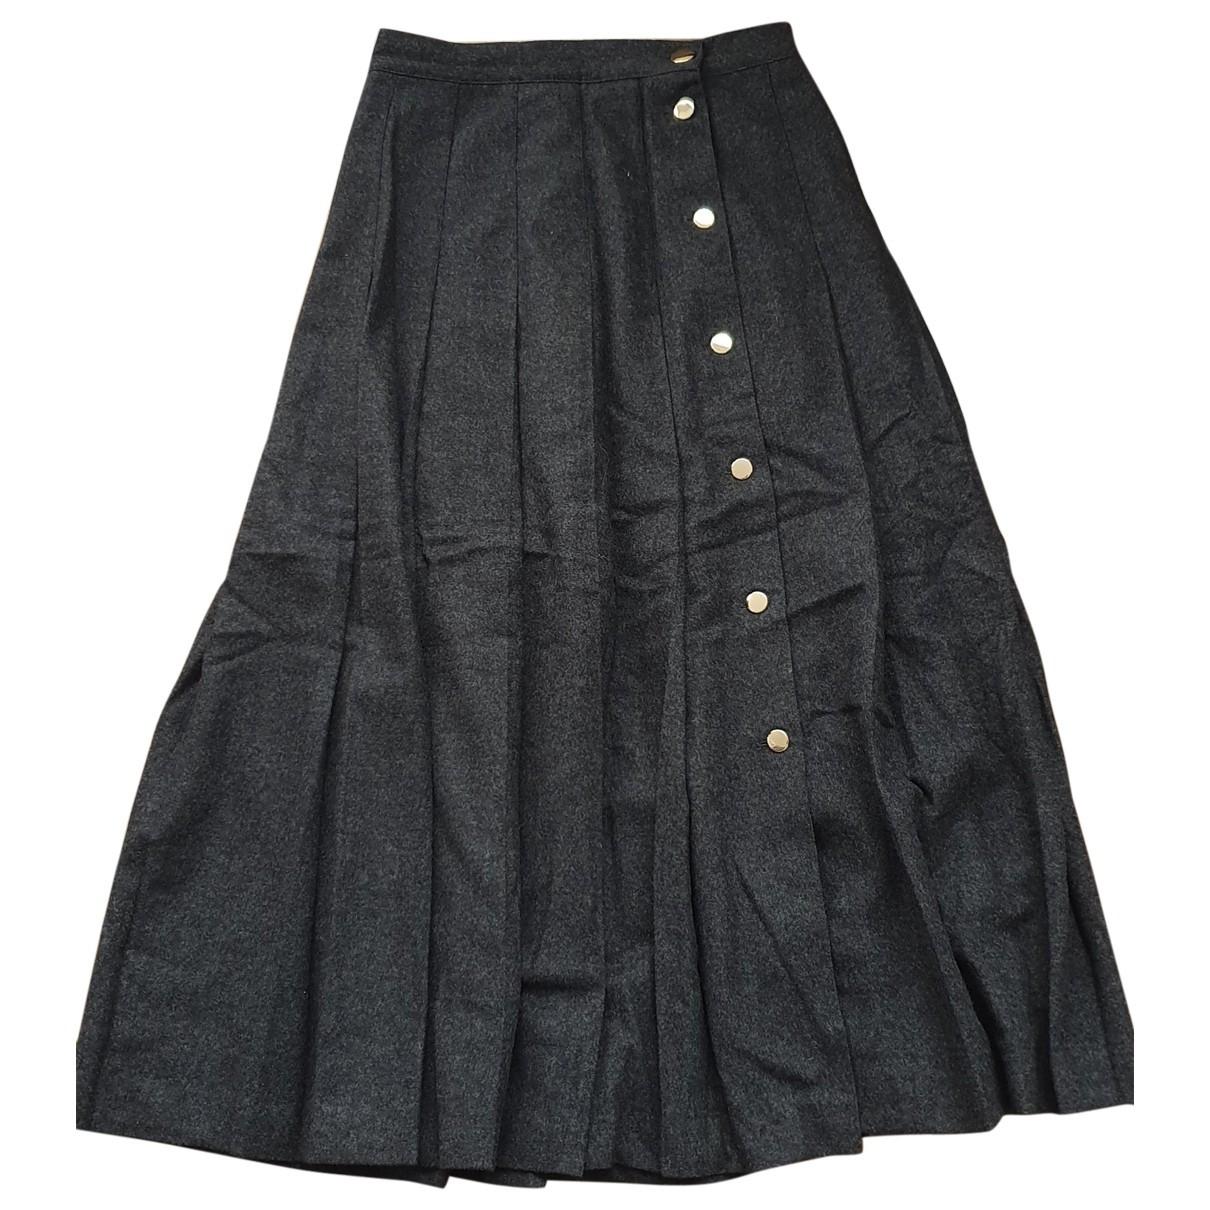 Max Mara \N Grey Wool skirt for Women 38 FR